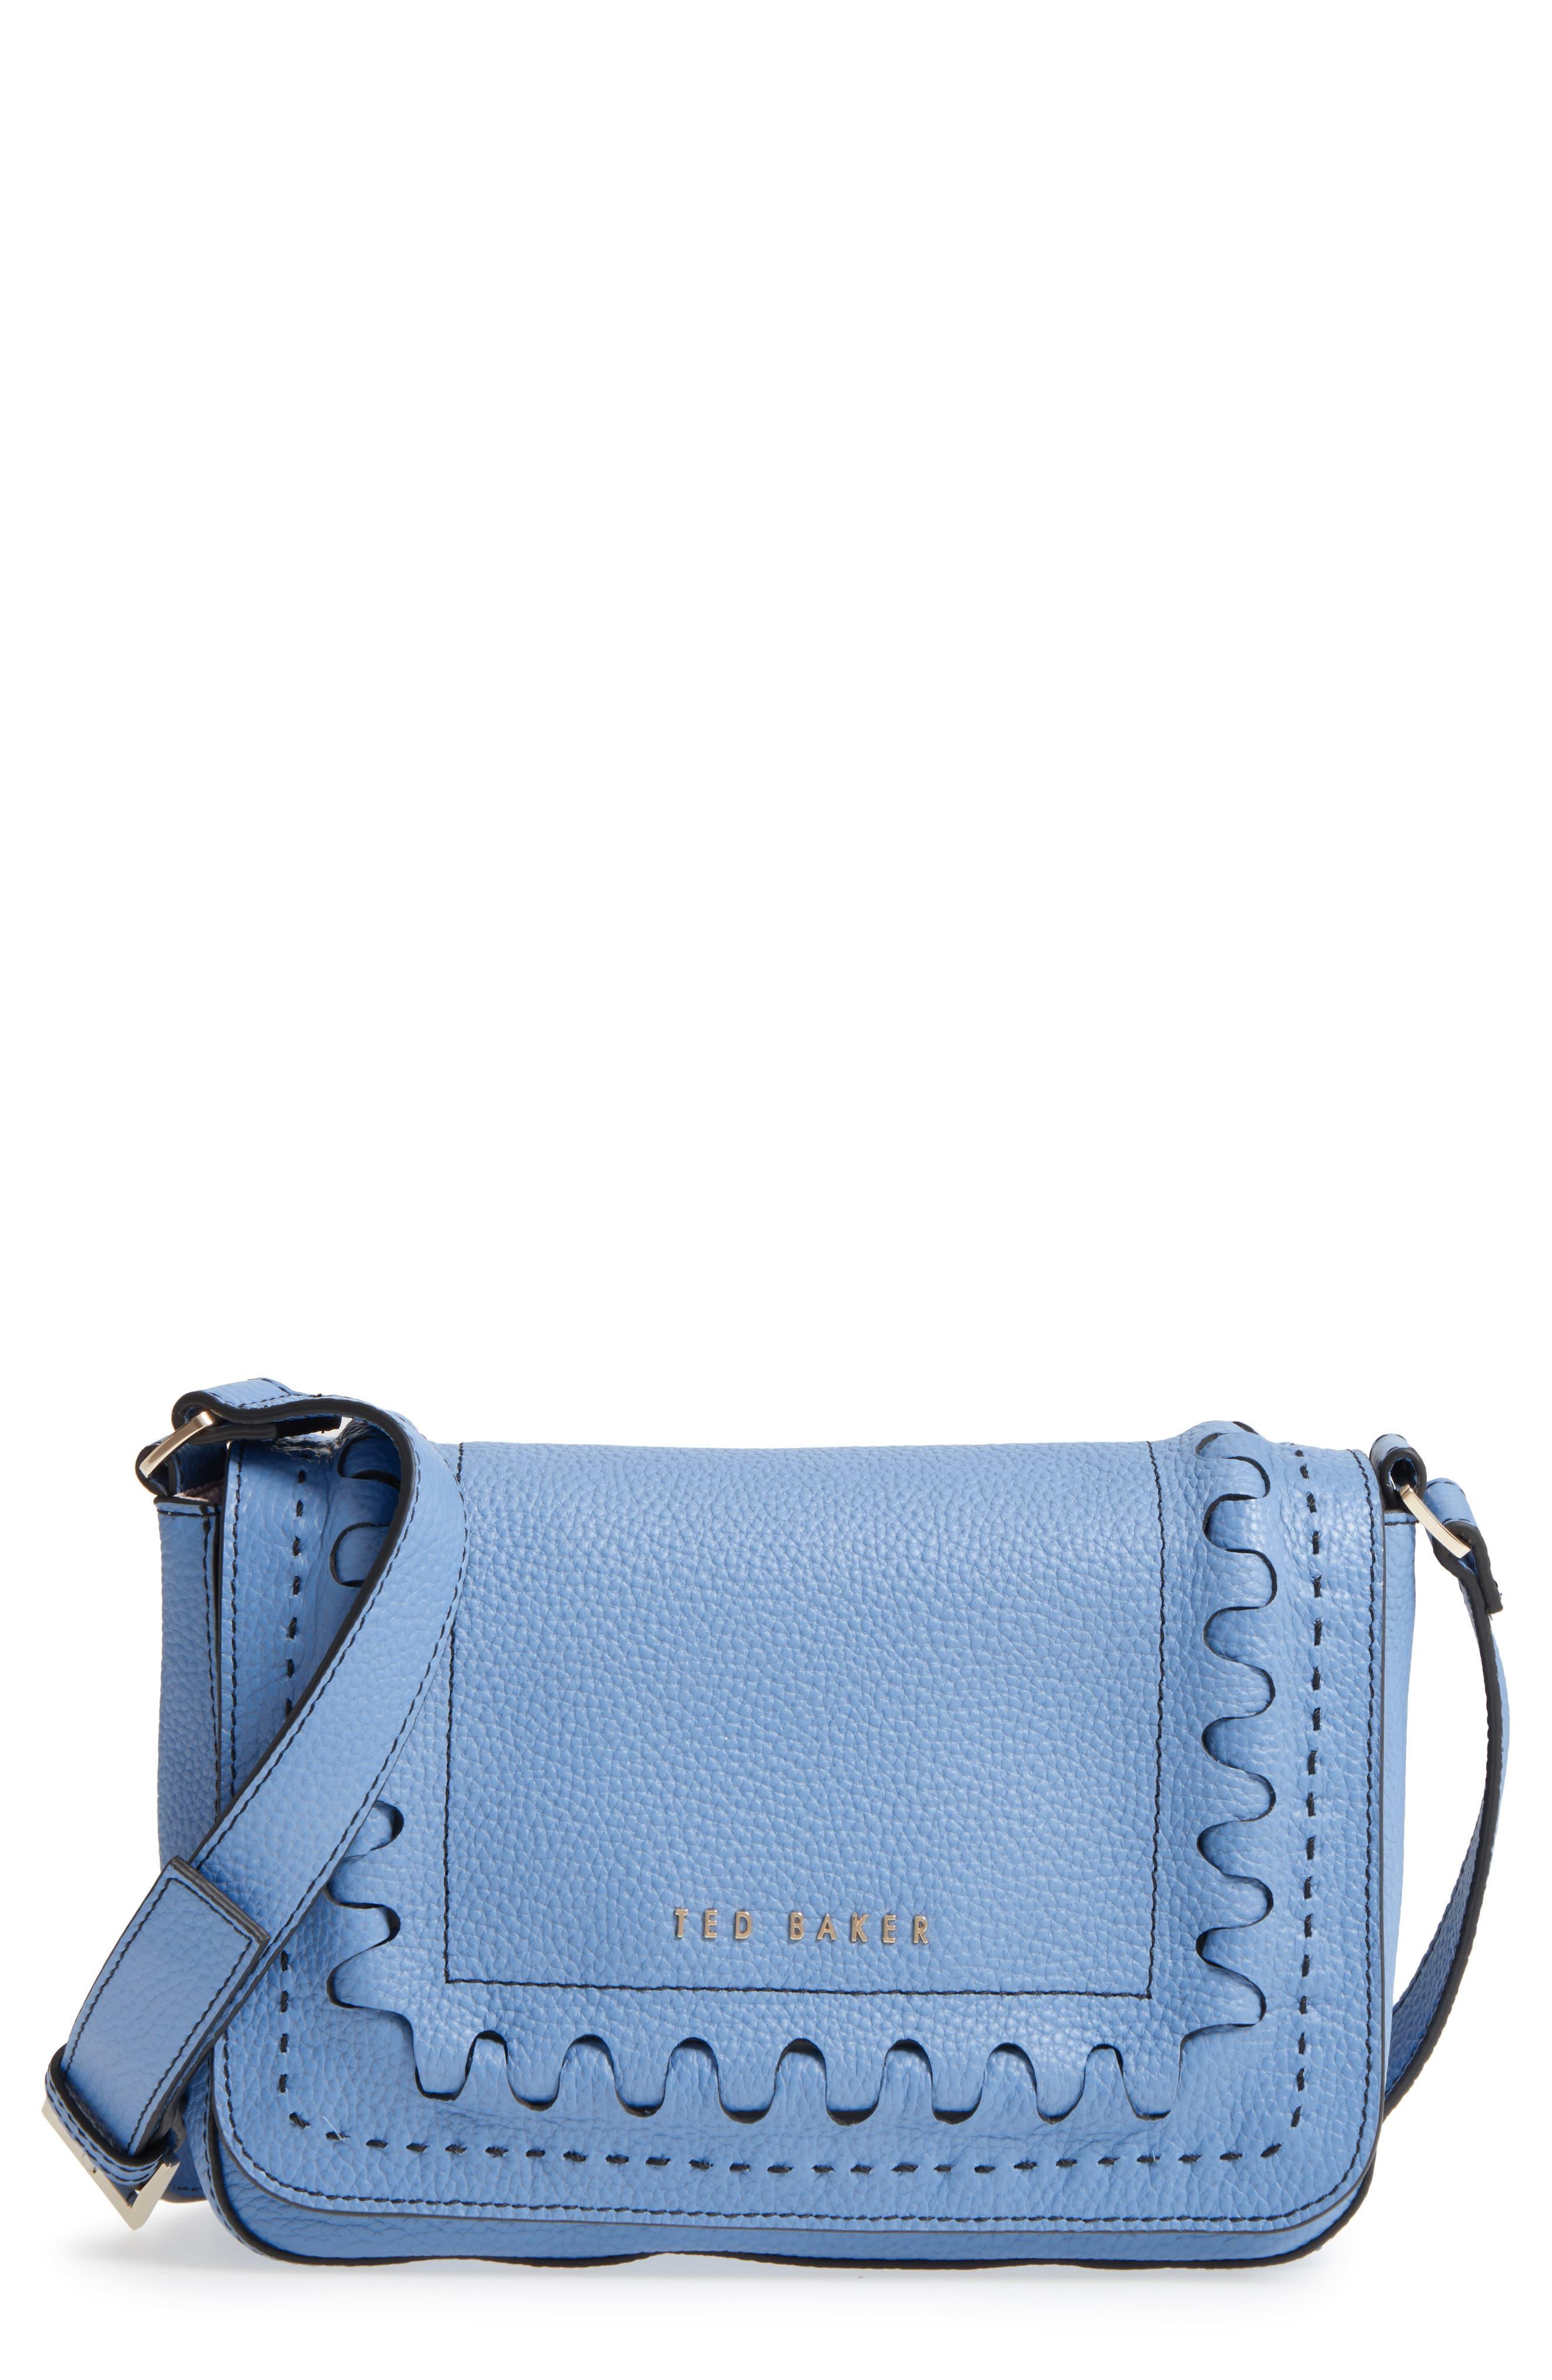 Tippi Leather Crossbody Bag,                             Main thumbnail 2, color,